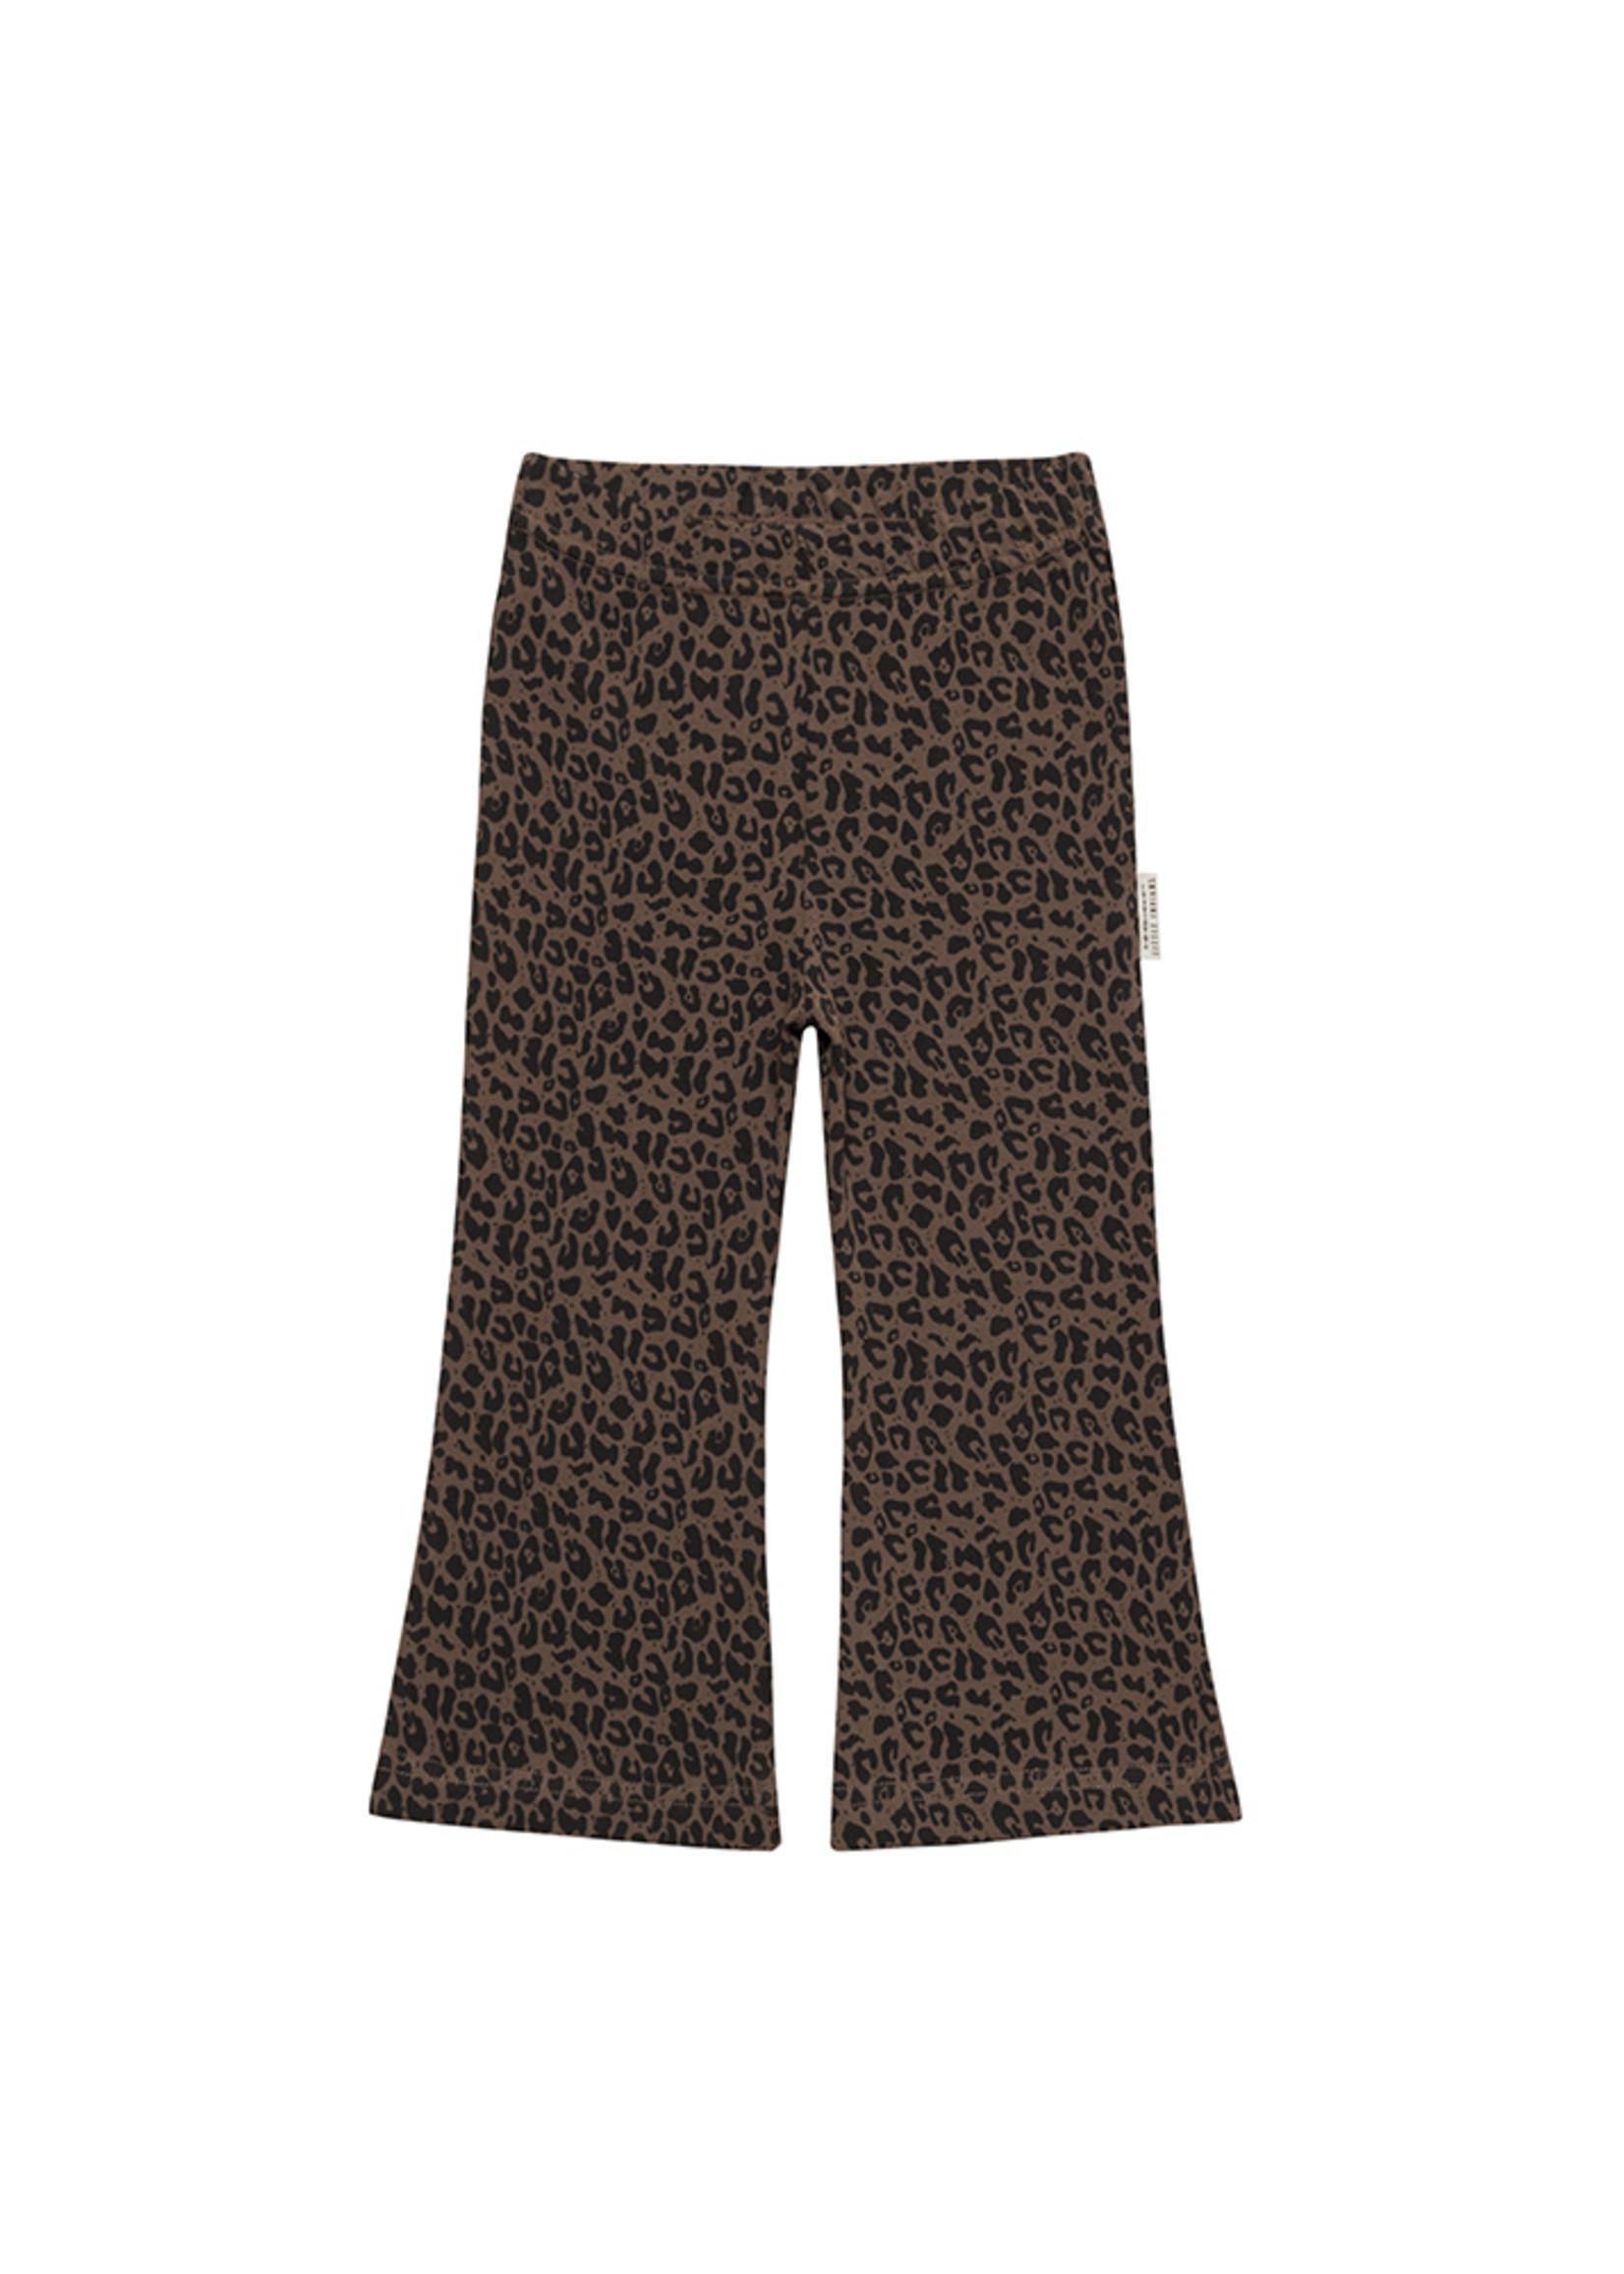 Little Indians LI - Flared Pants - Leopard - Fondue Fudge